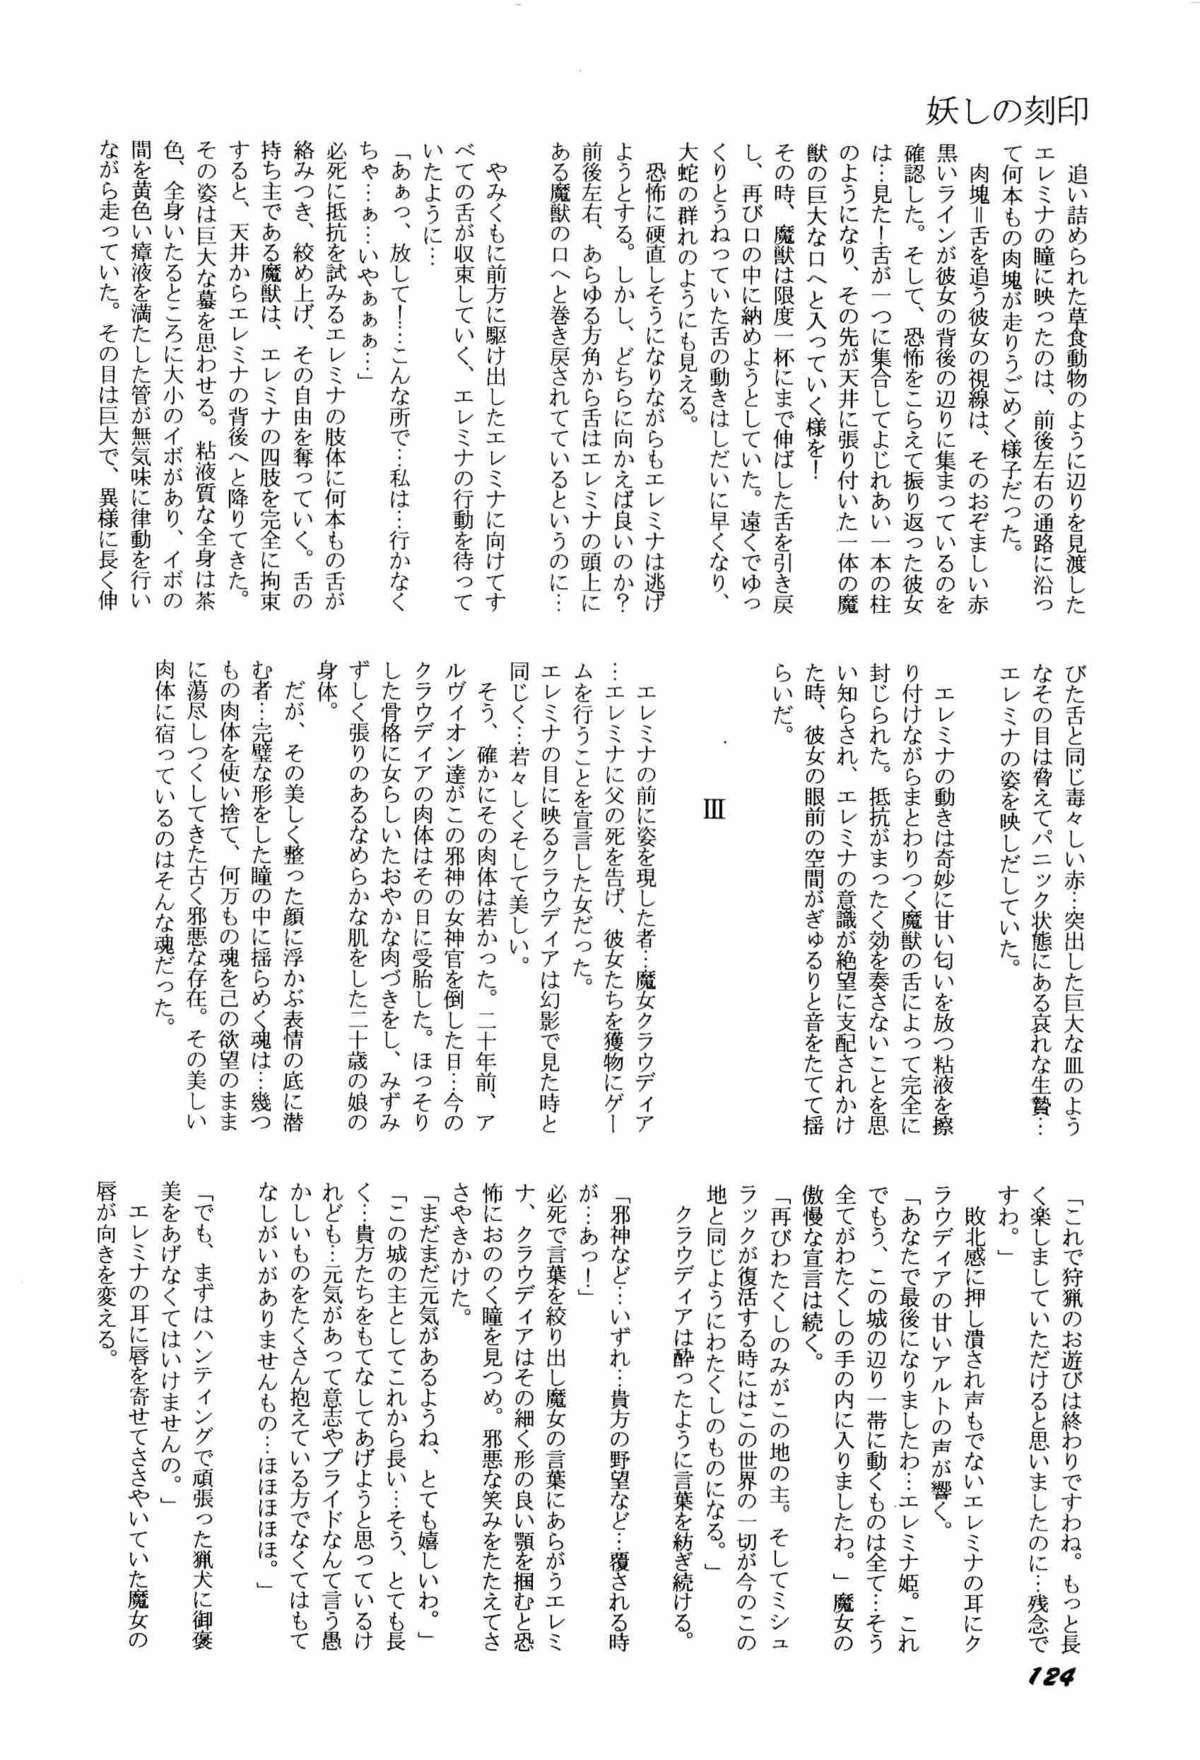 Bisyoujo Anthology '93 jyoukan 126